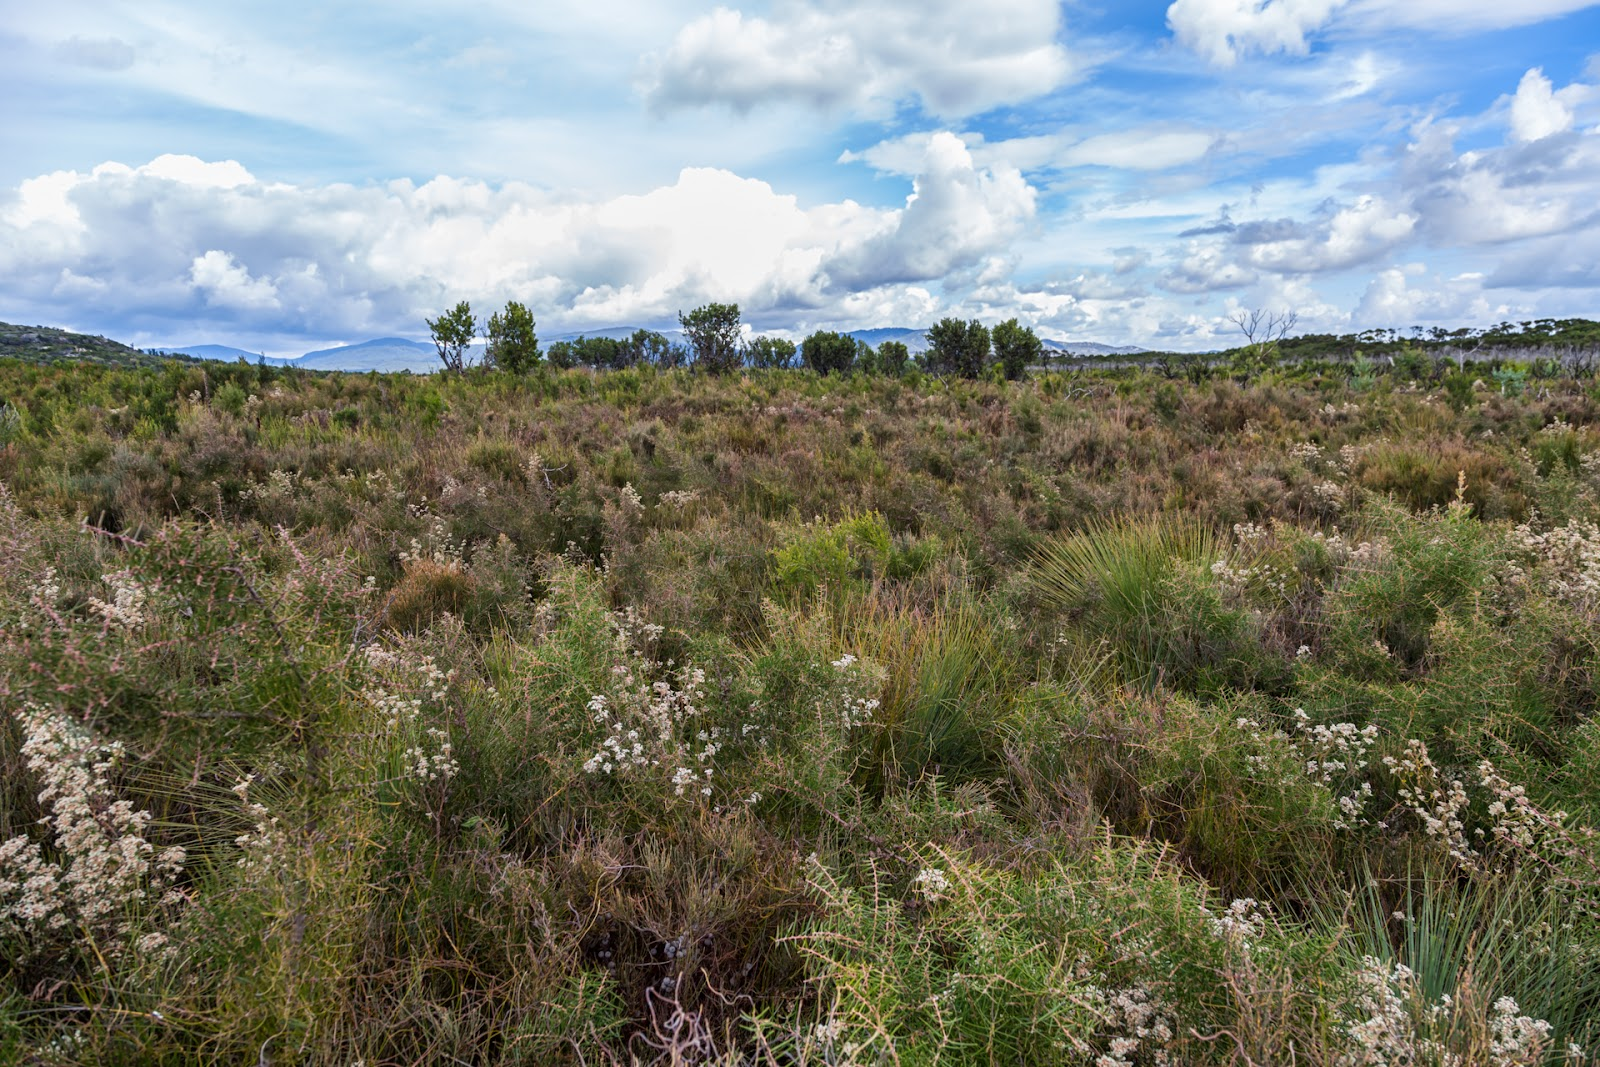 scrub wilderness northern wilsons promontory